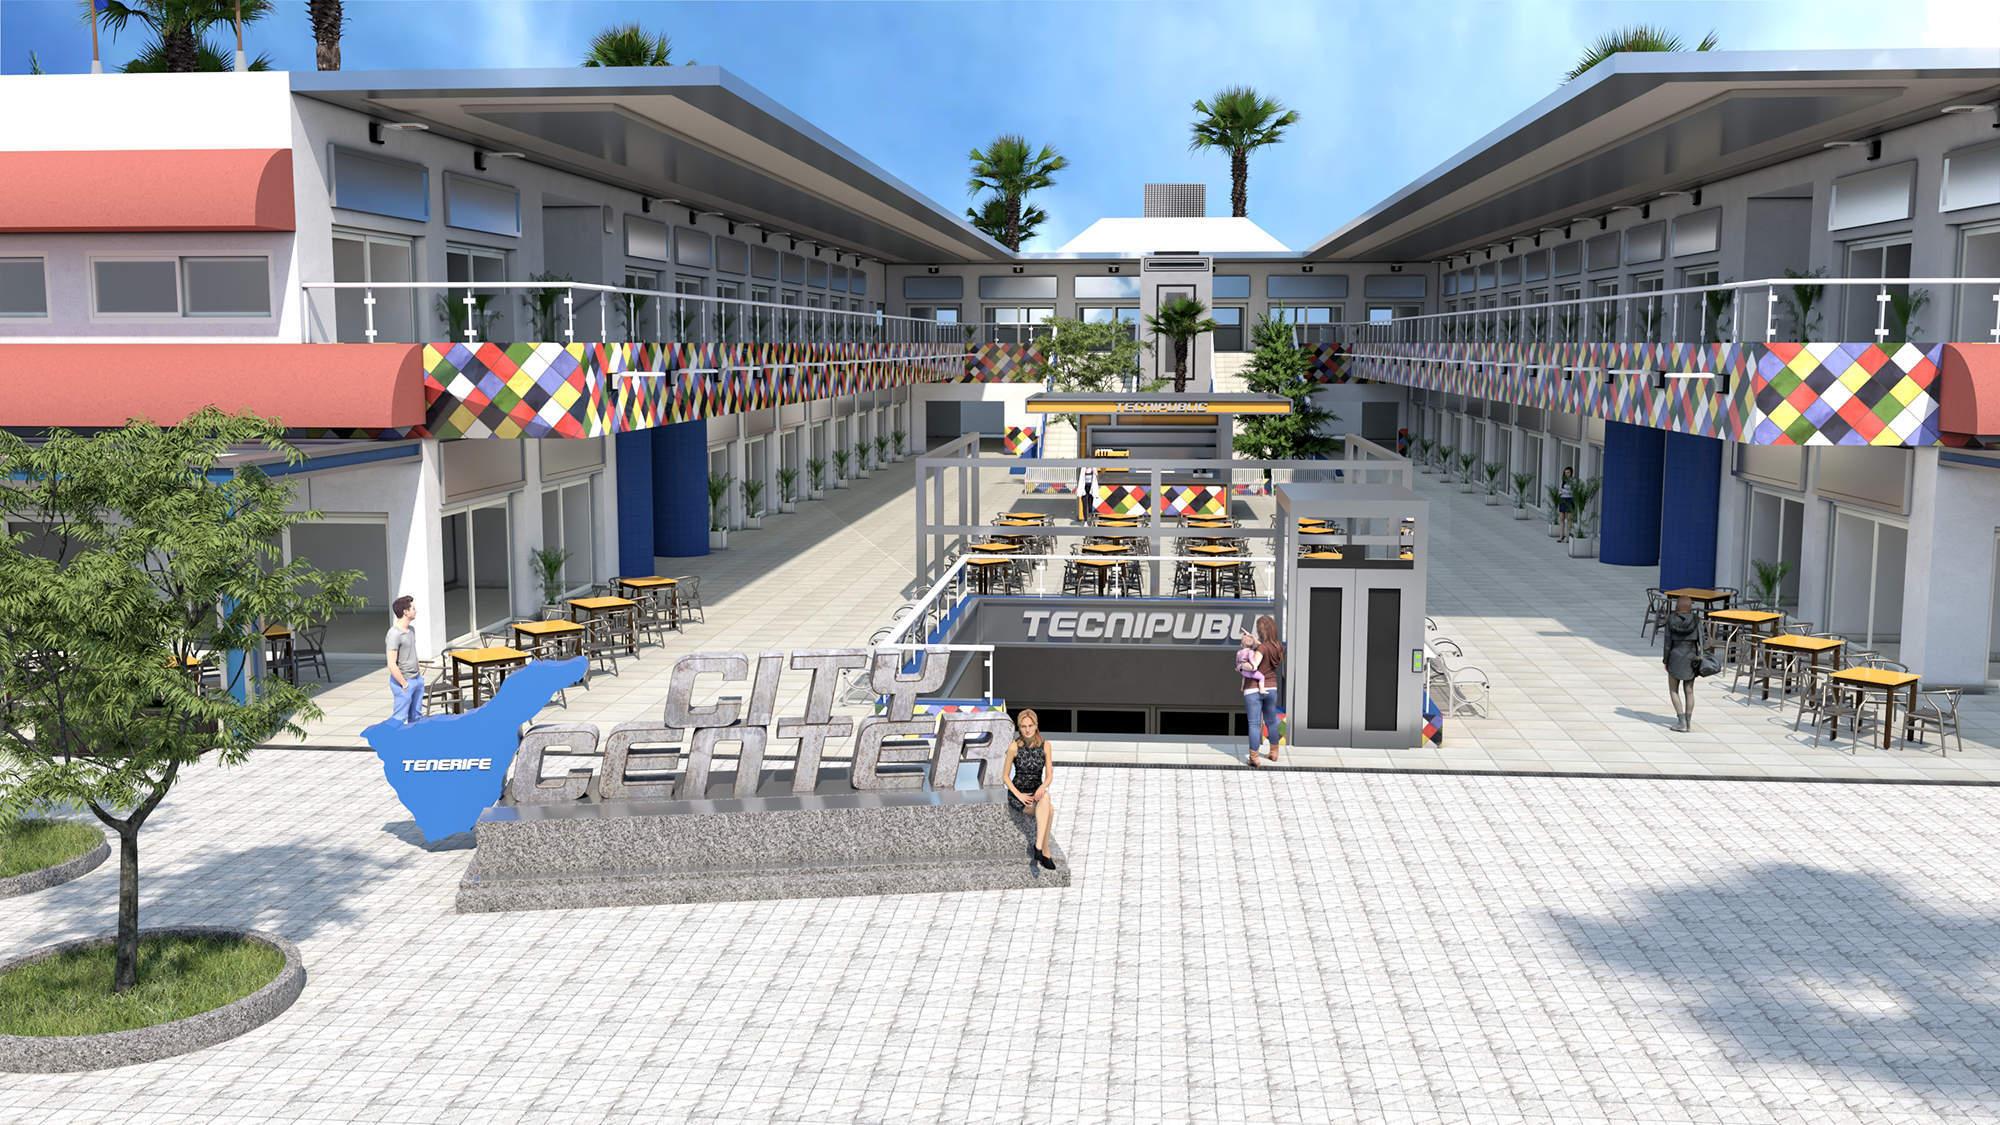 Render -4- City Center - 2019, Tenerife